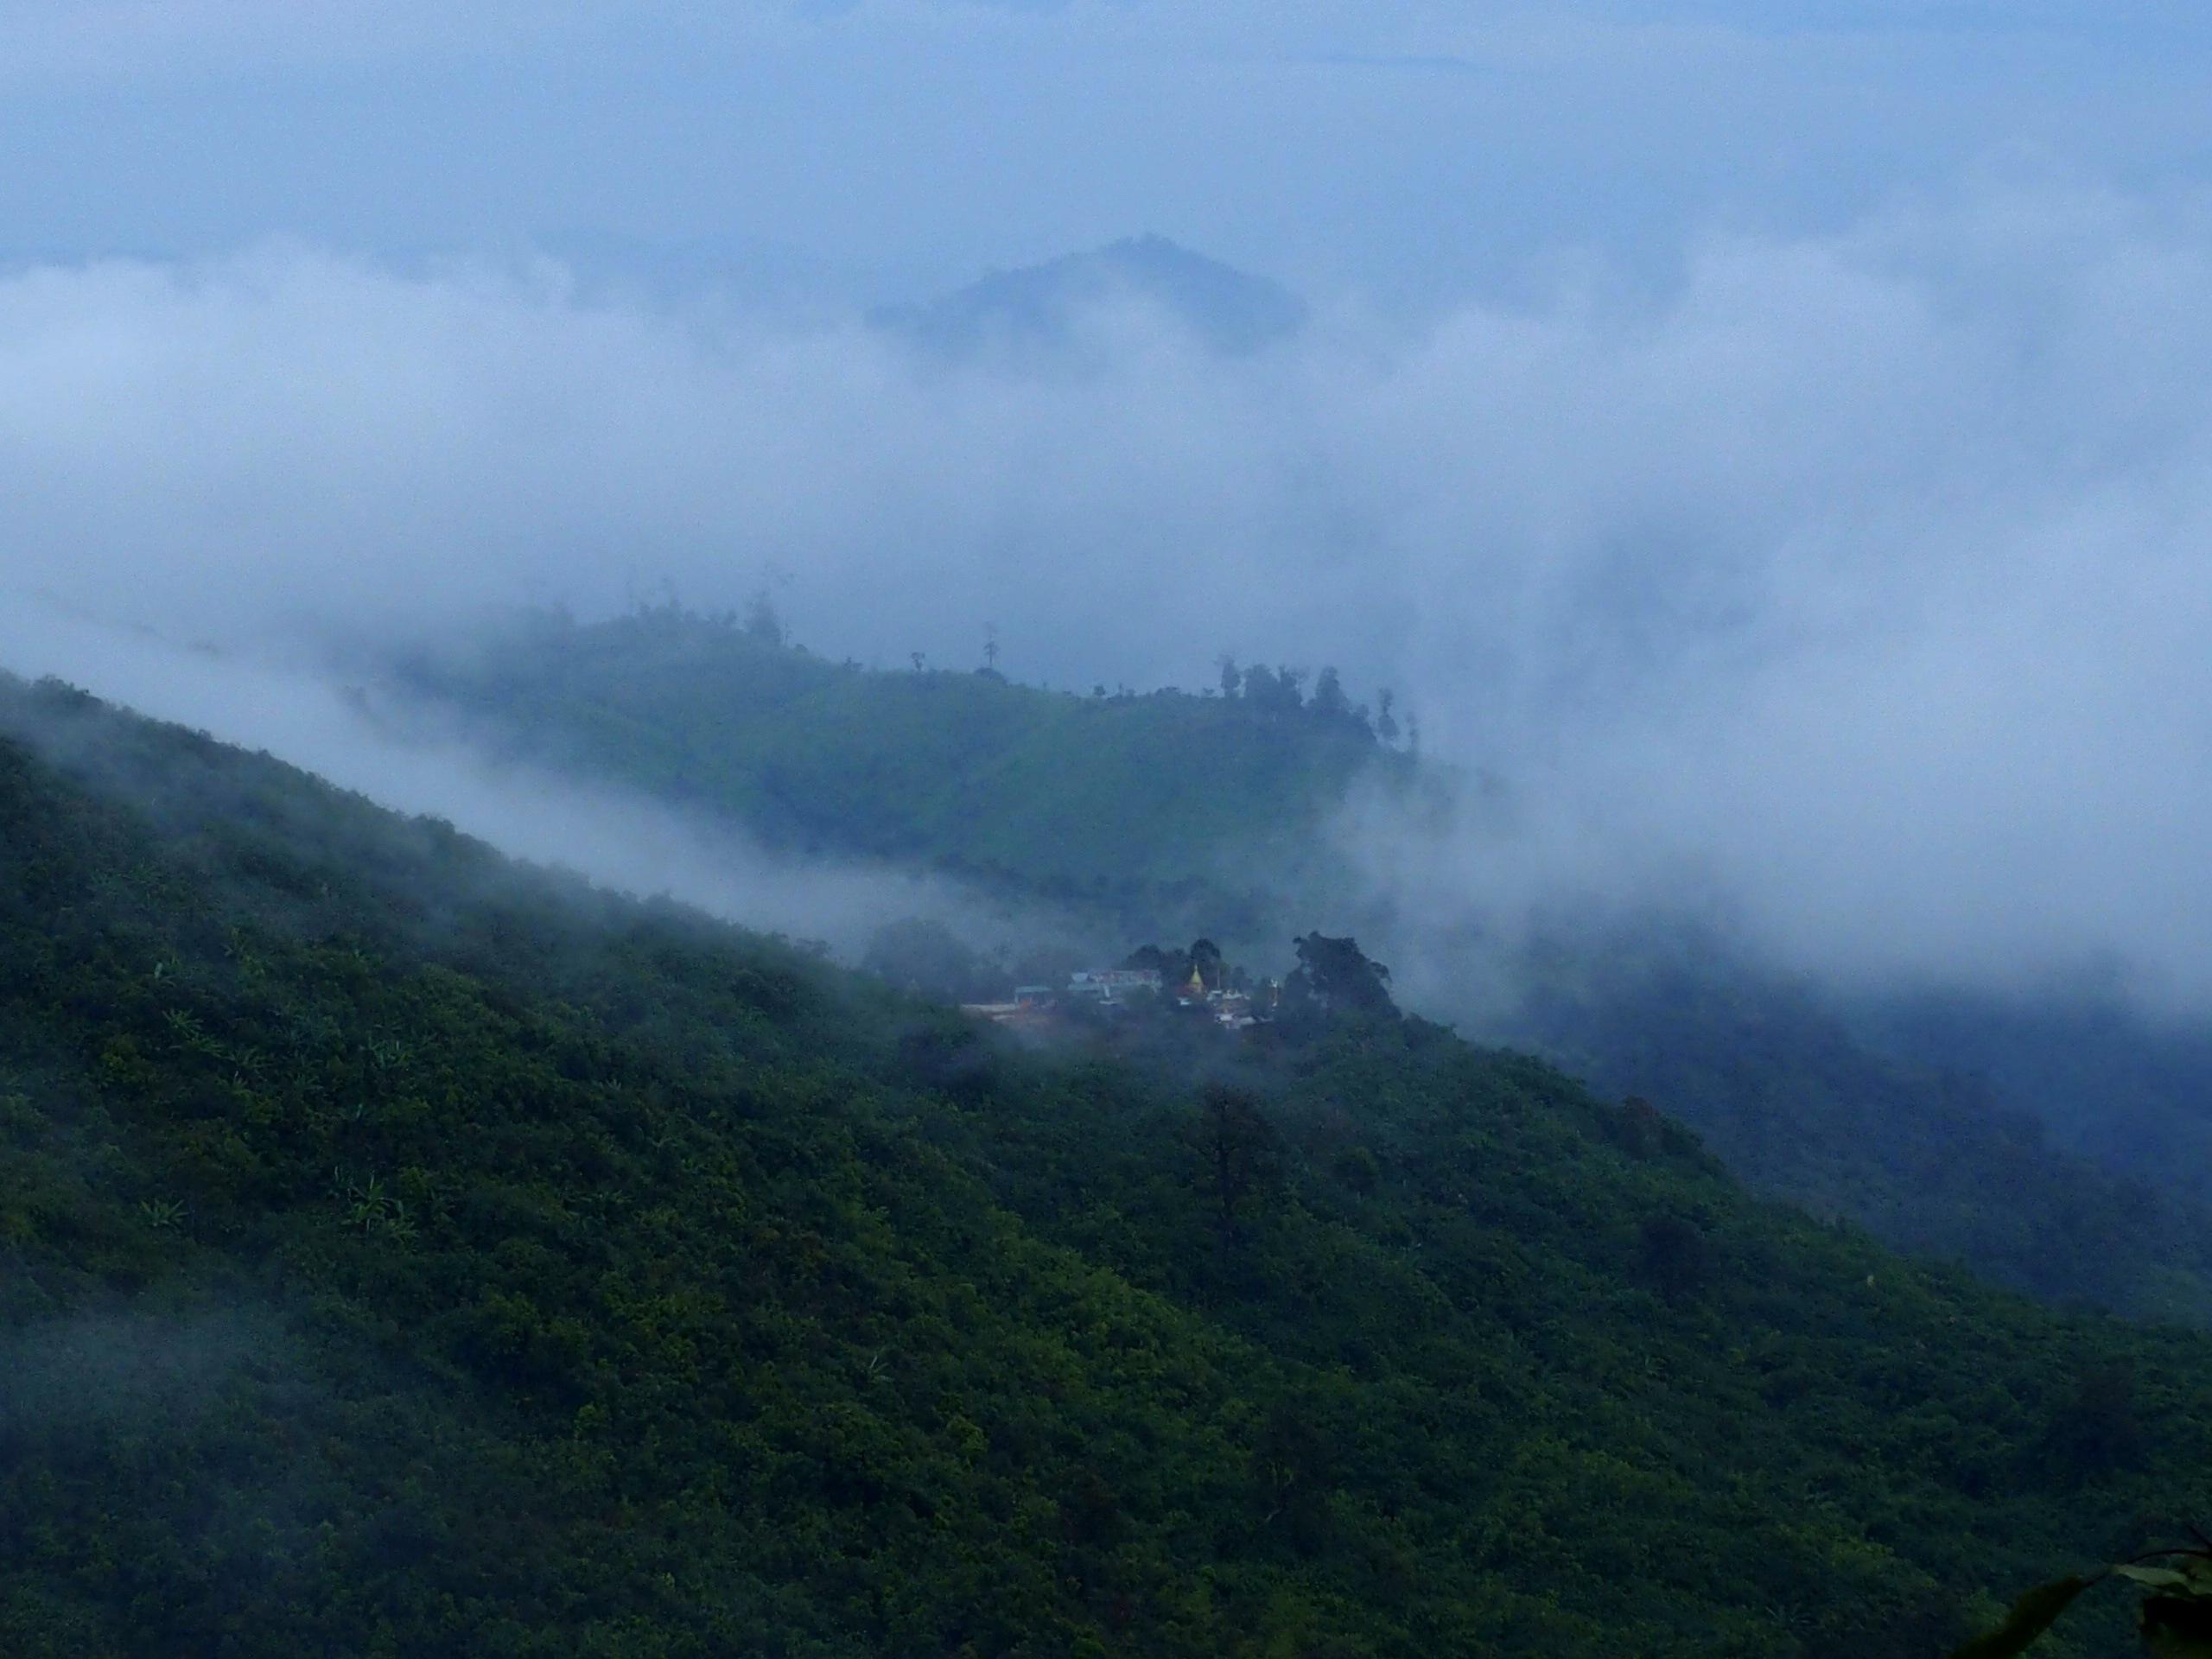 Village-du-Rocher-dOr-dans-le-brouillard-Myanmar